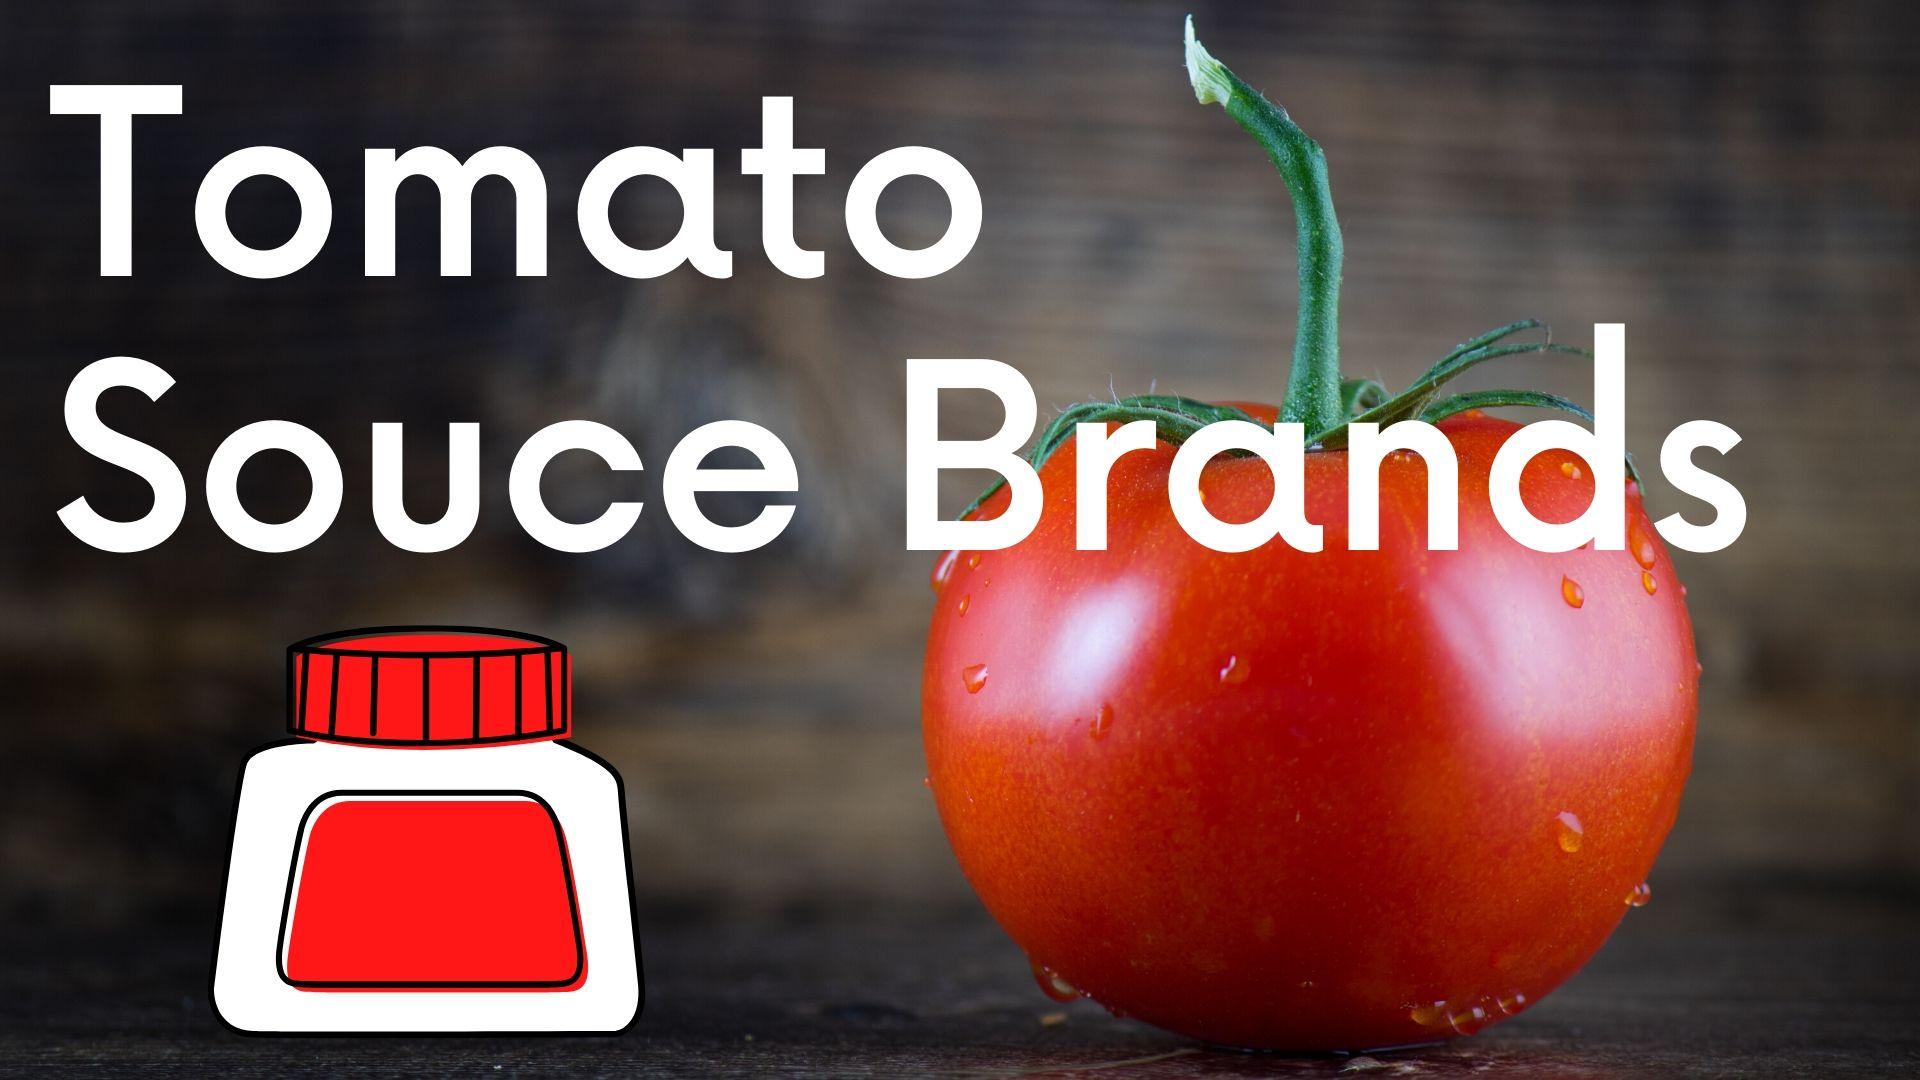 Best Tomato Souce Brand